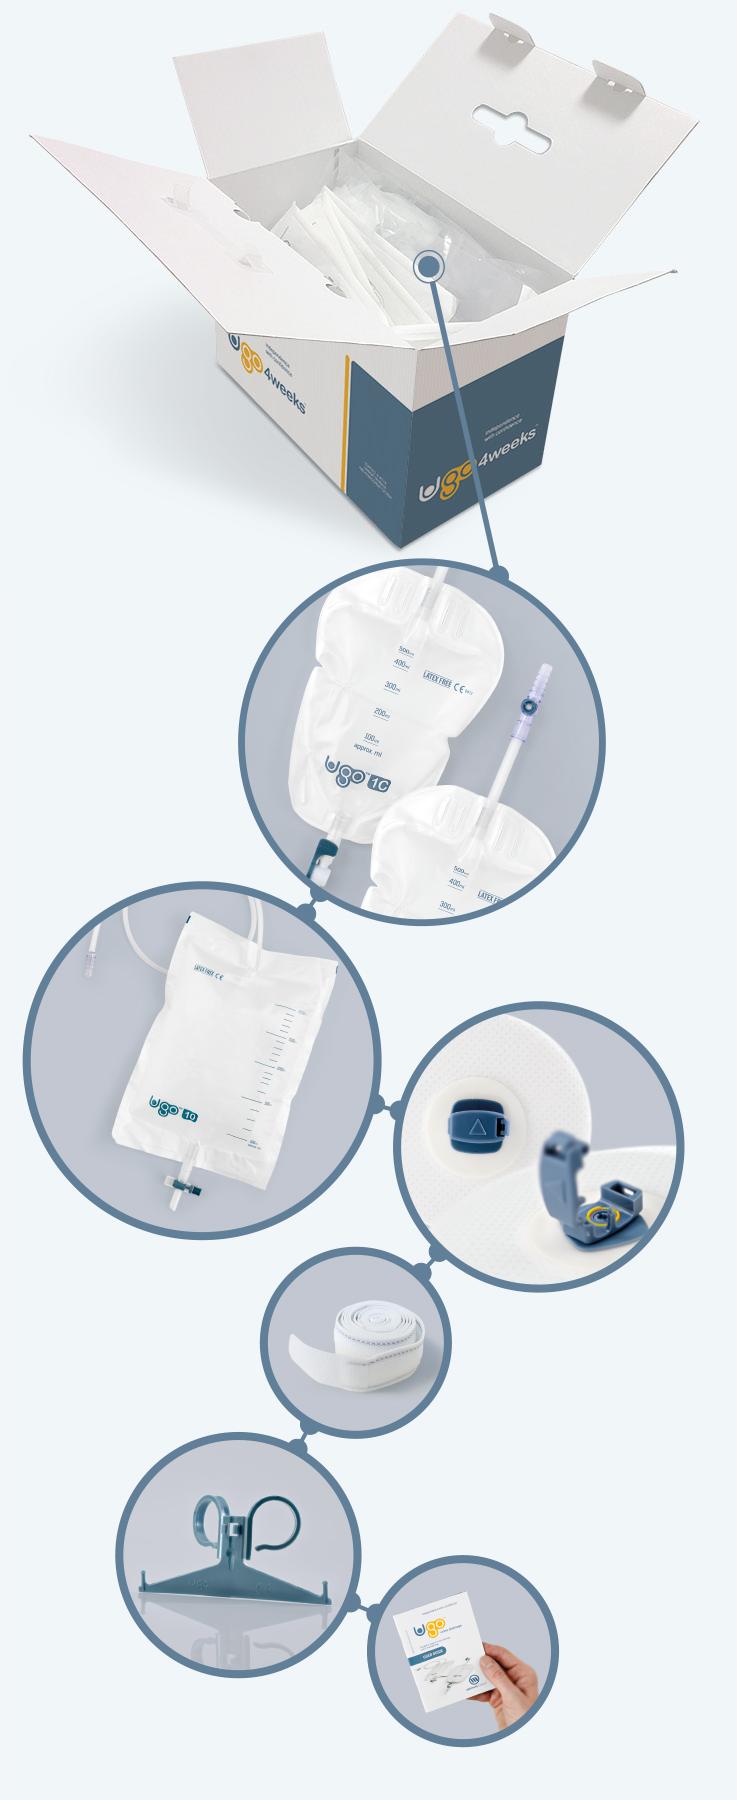 Ugo 4 Weeks urinary drainage system